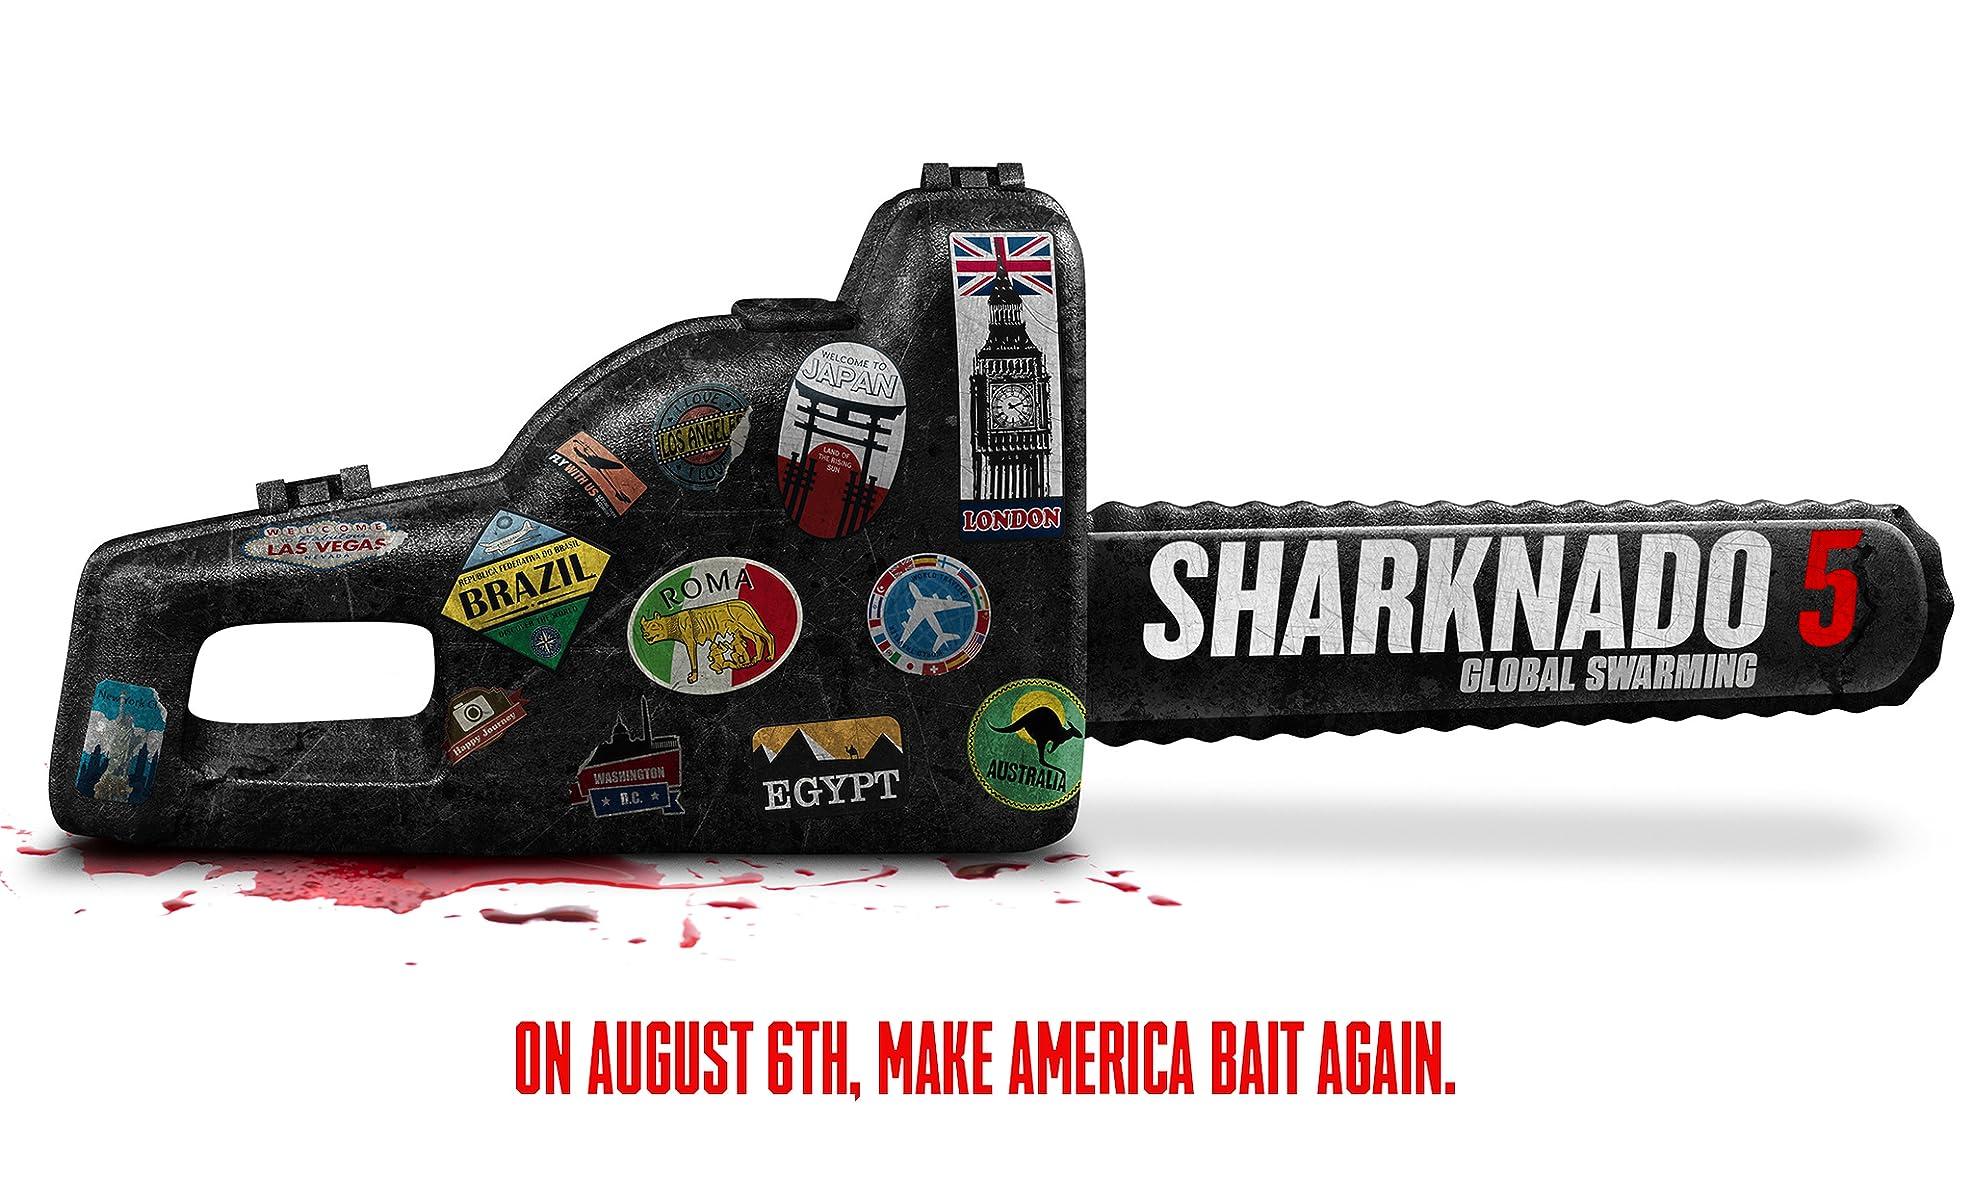 Sharknado Imdb Images - Reverse Search